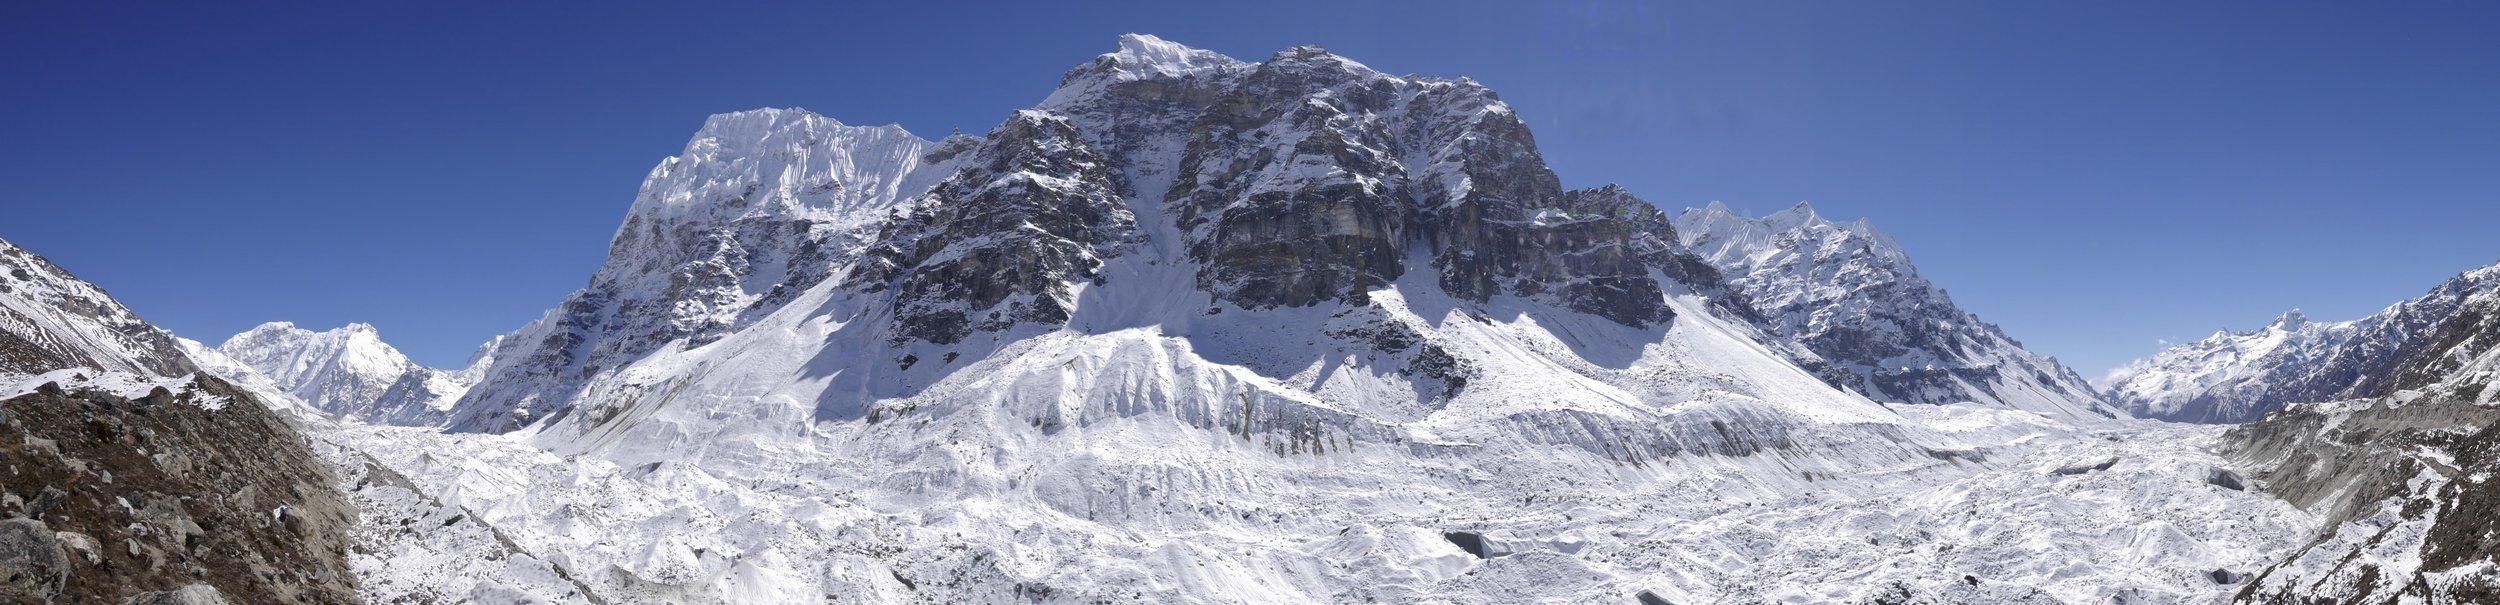 Kangchendzonga Glacier Wedge Peak and Gimmigela Peak.